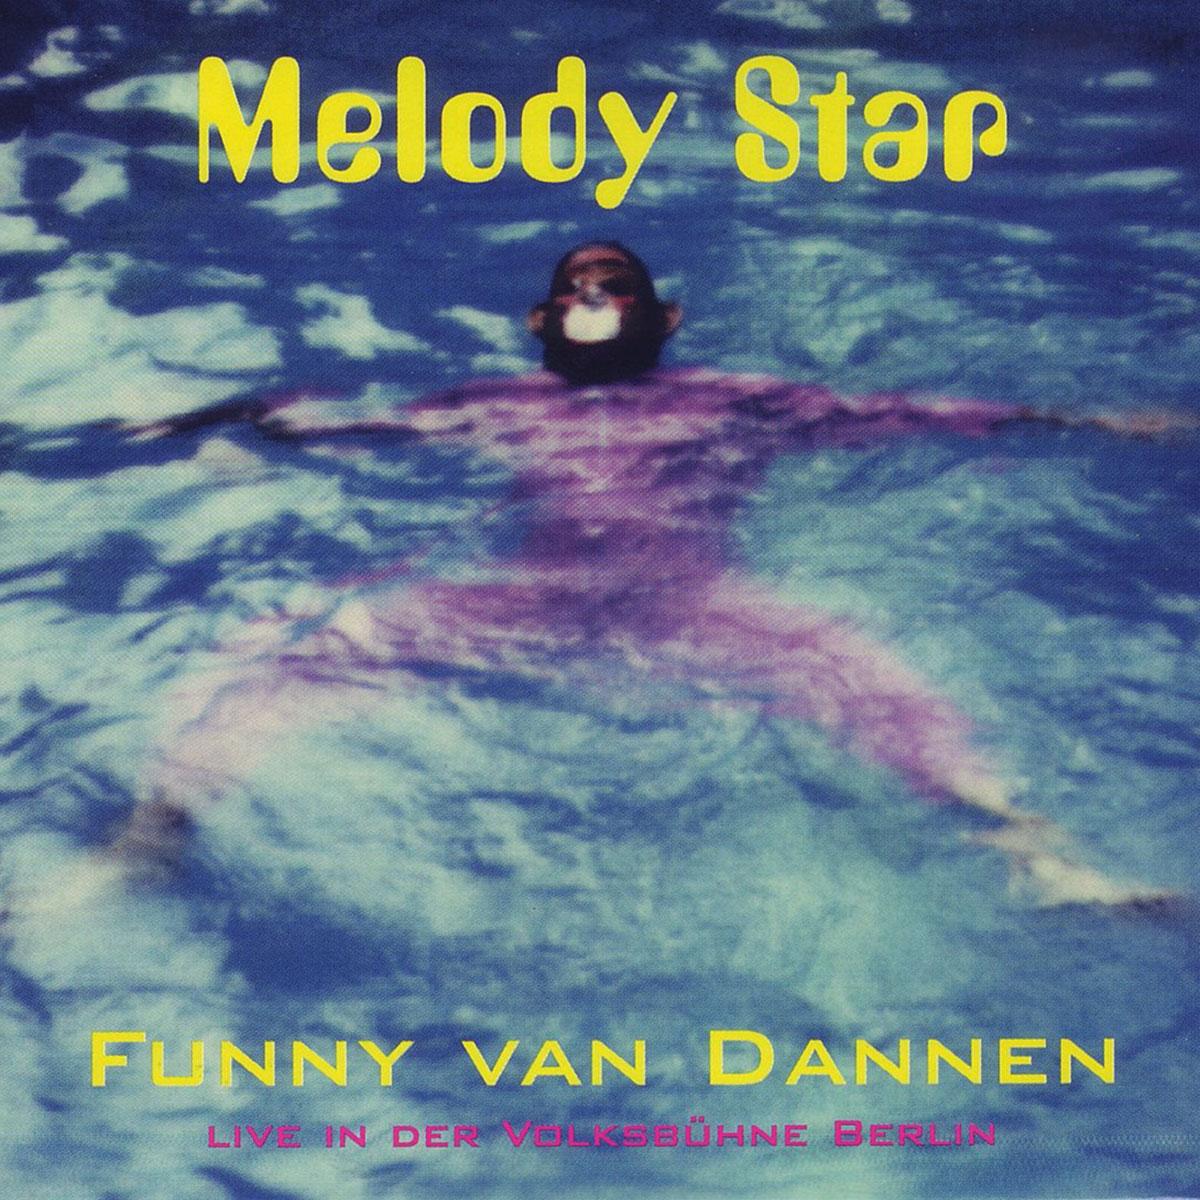 Funny van Dannen - Melody Star